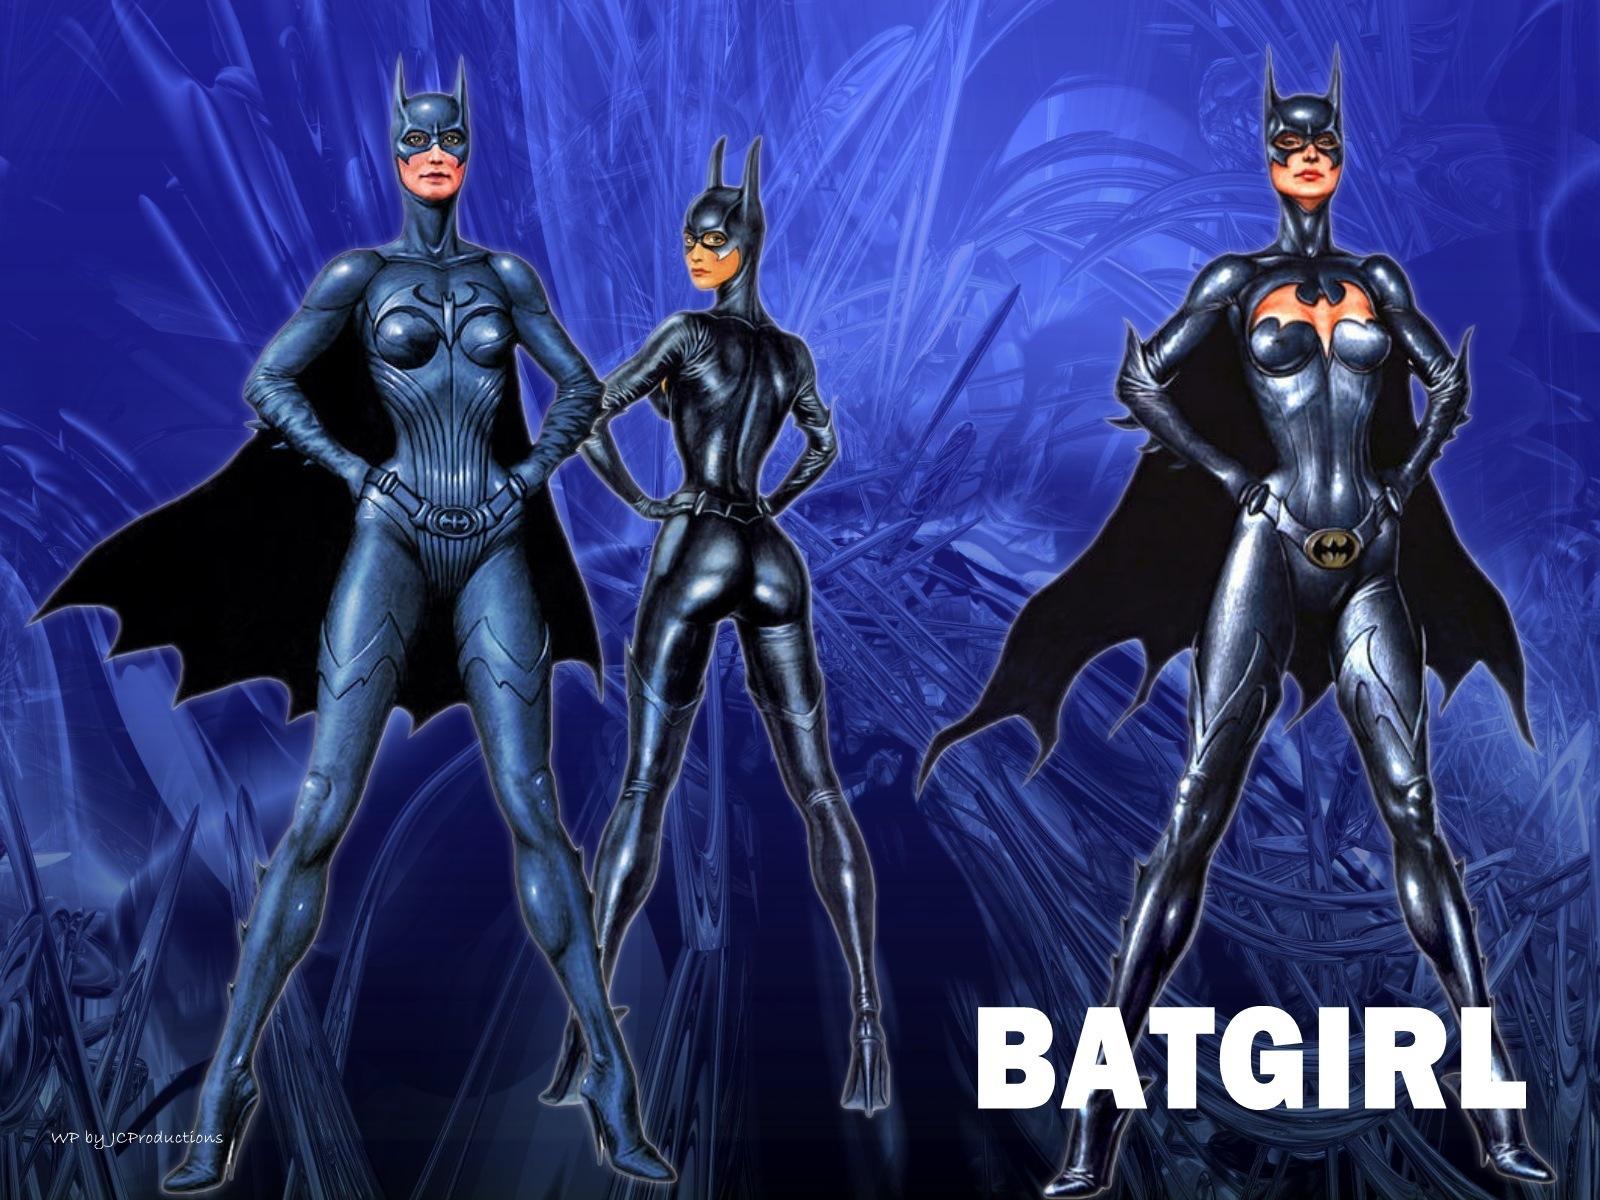 Batgirl in the spotlight